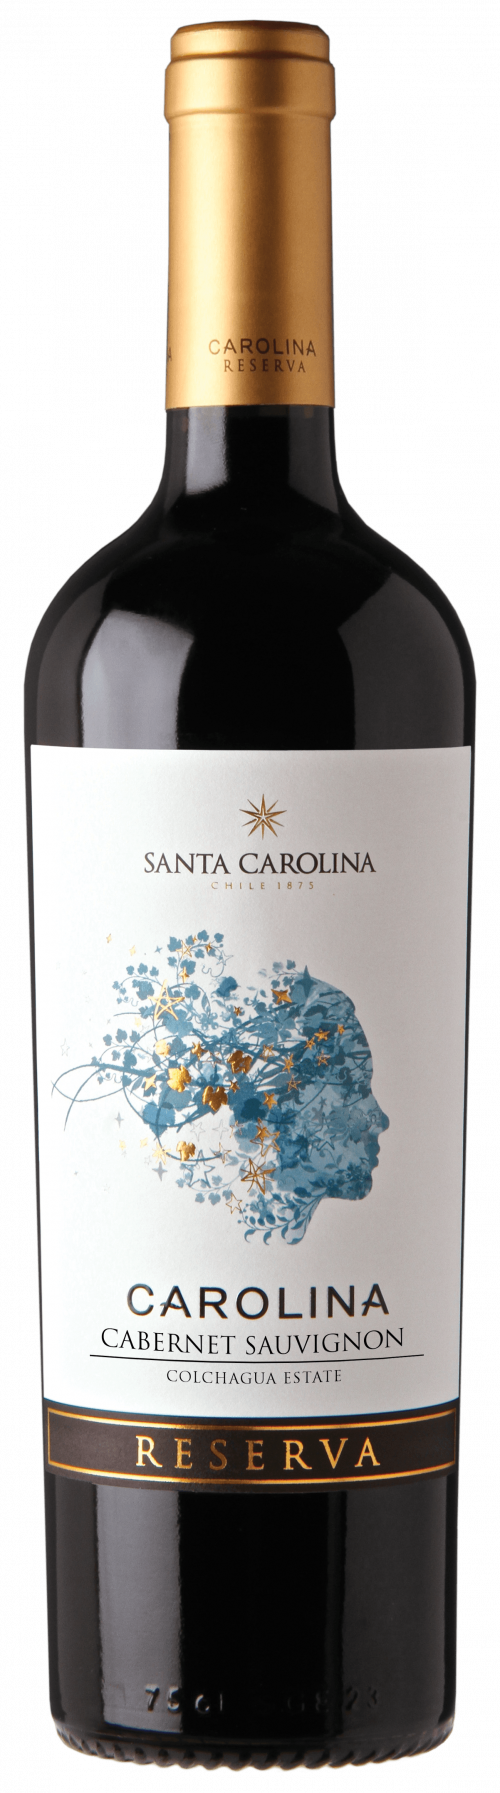 2018 Santa Carolina Reserva Cabernet Sauvignon 750ml